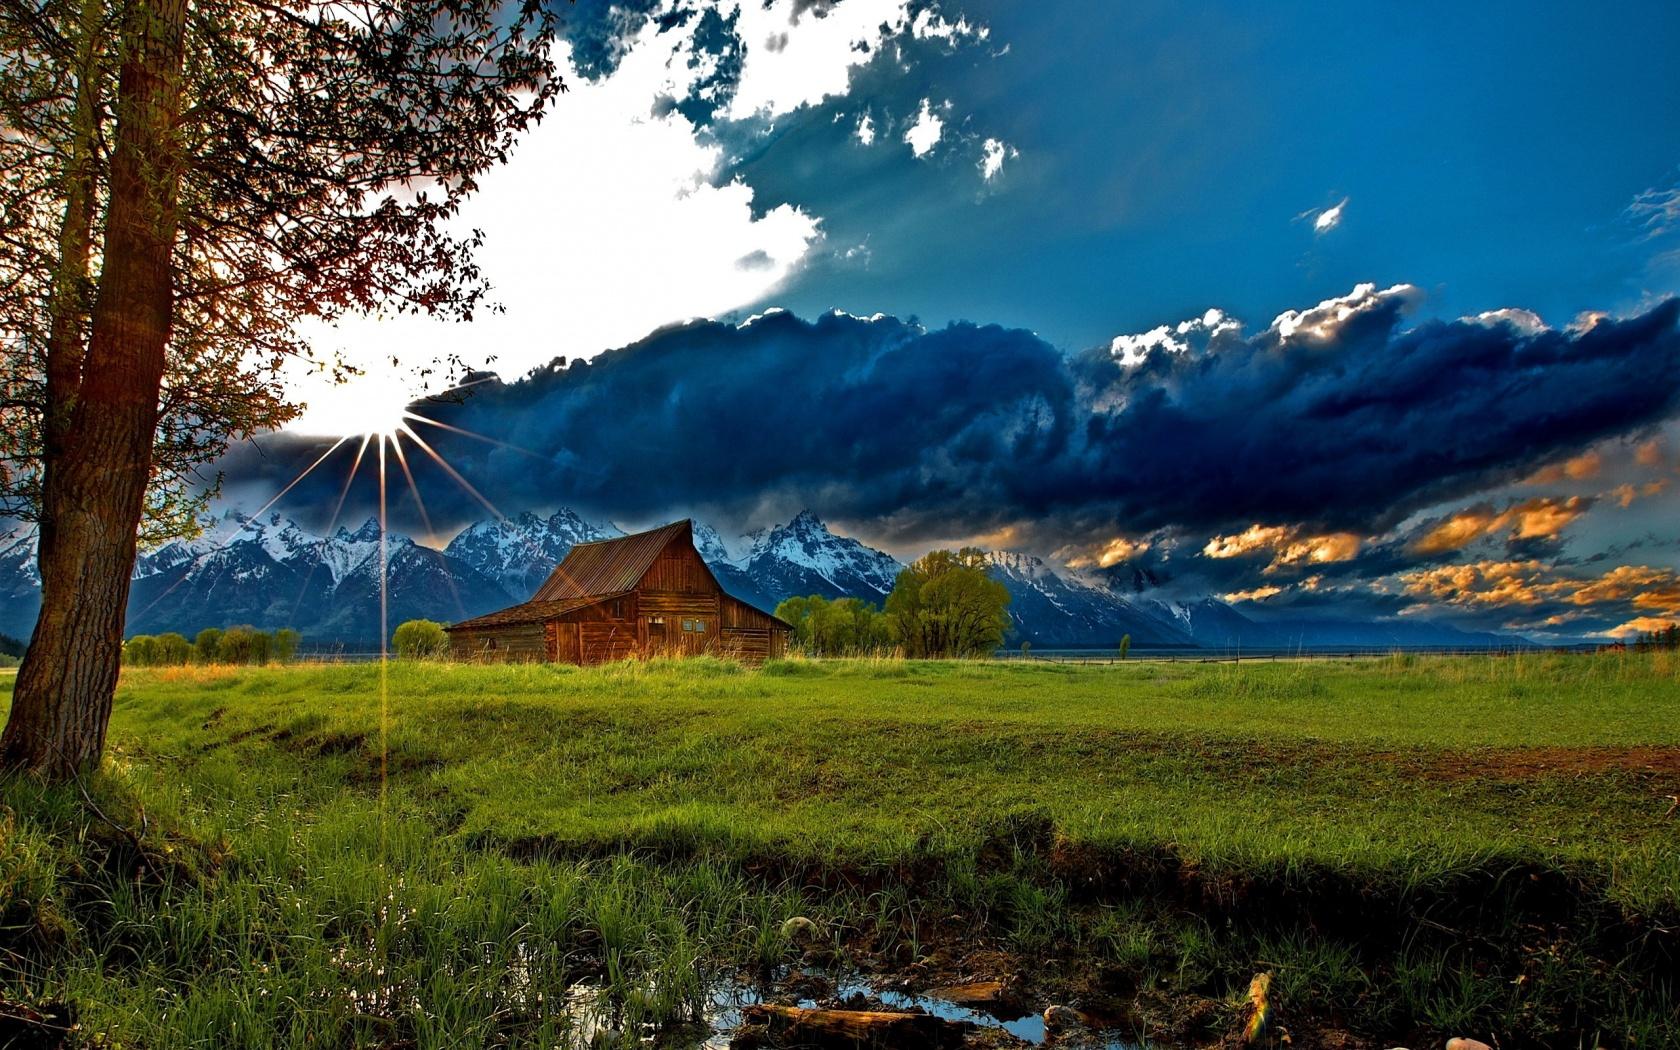 Mountain Cabin Wallpapers   1680x1050   891445 1680x1050